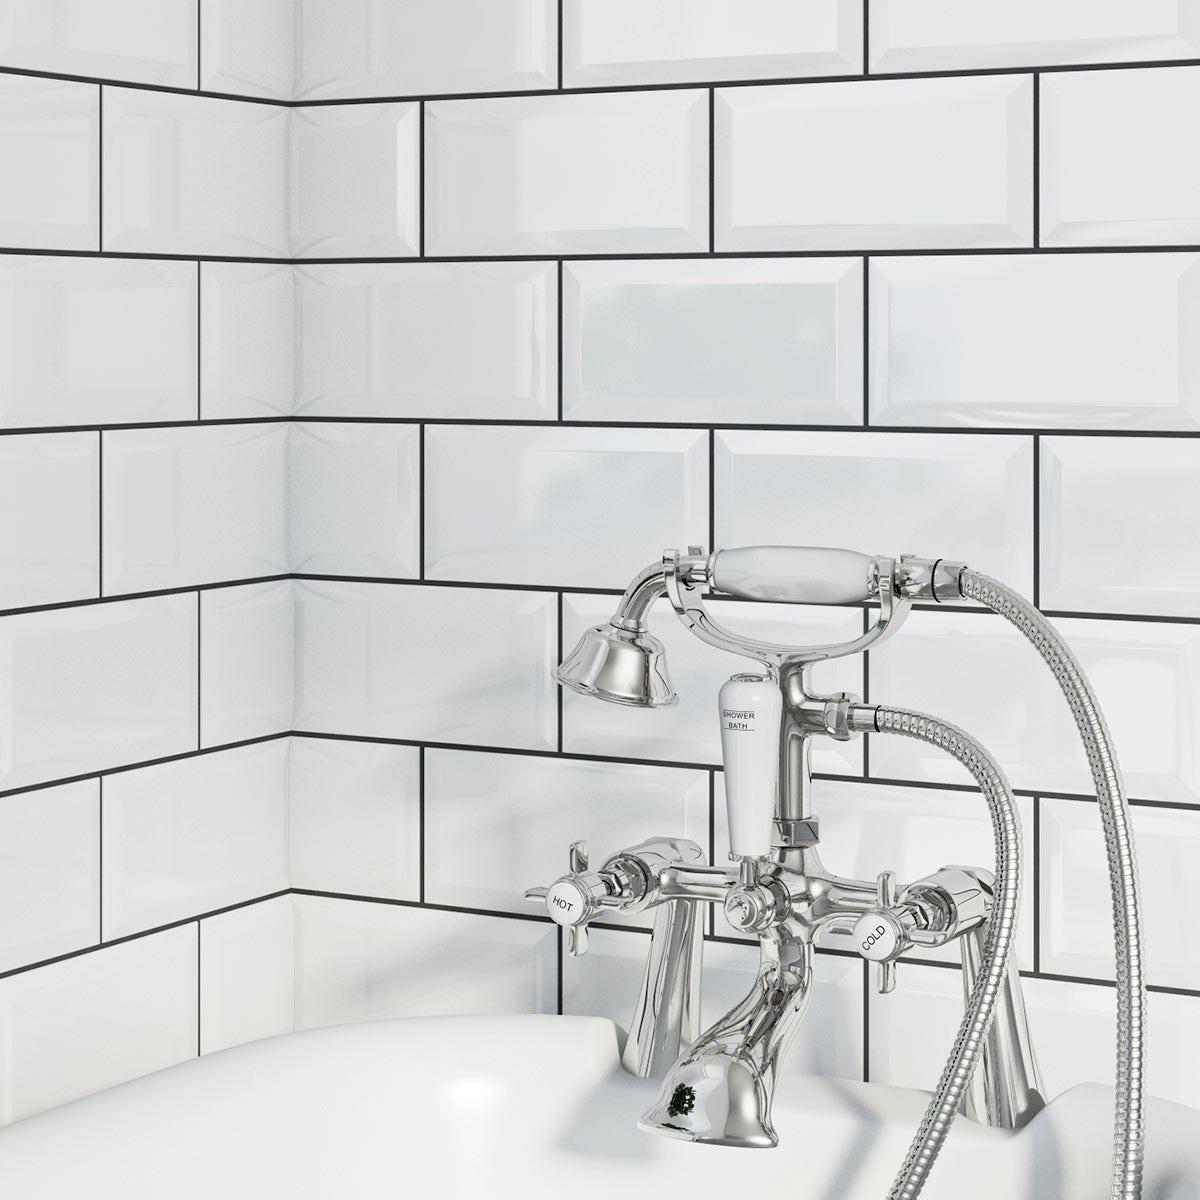 British ceramic tile metro bevel white gloss tile 100mm x 200mm british ceramic tile metro bevel white gloss tile 100mm x 200mm dailygadgetfo Images